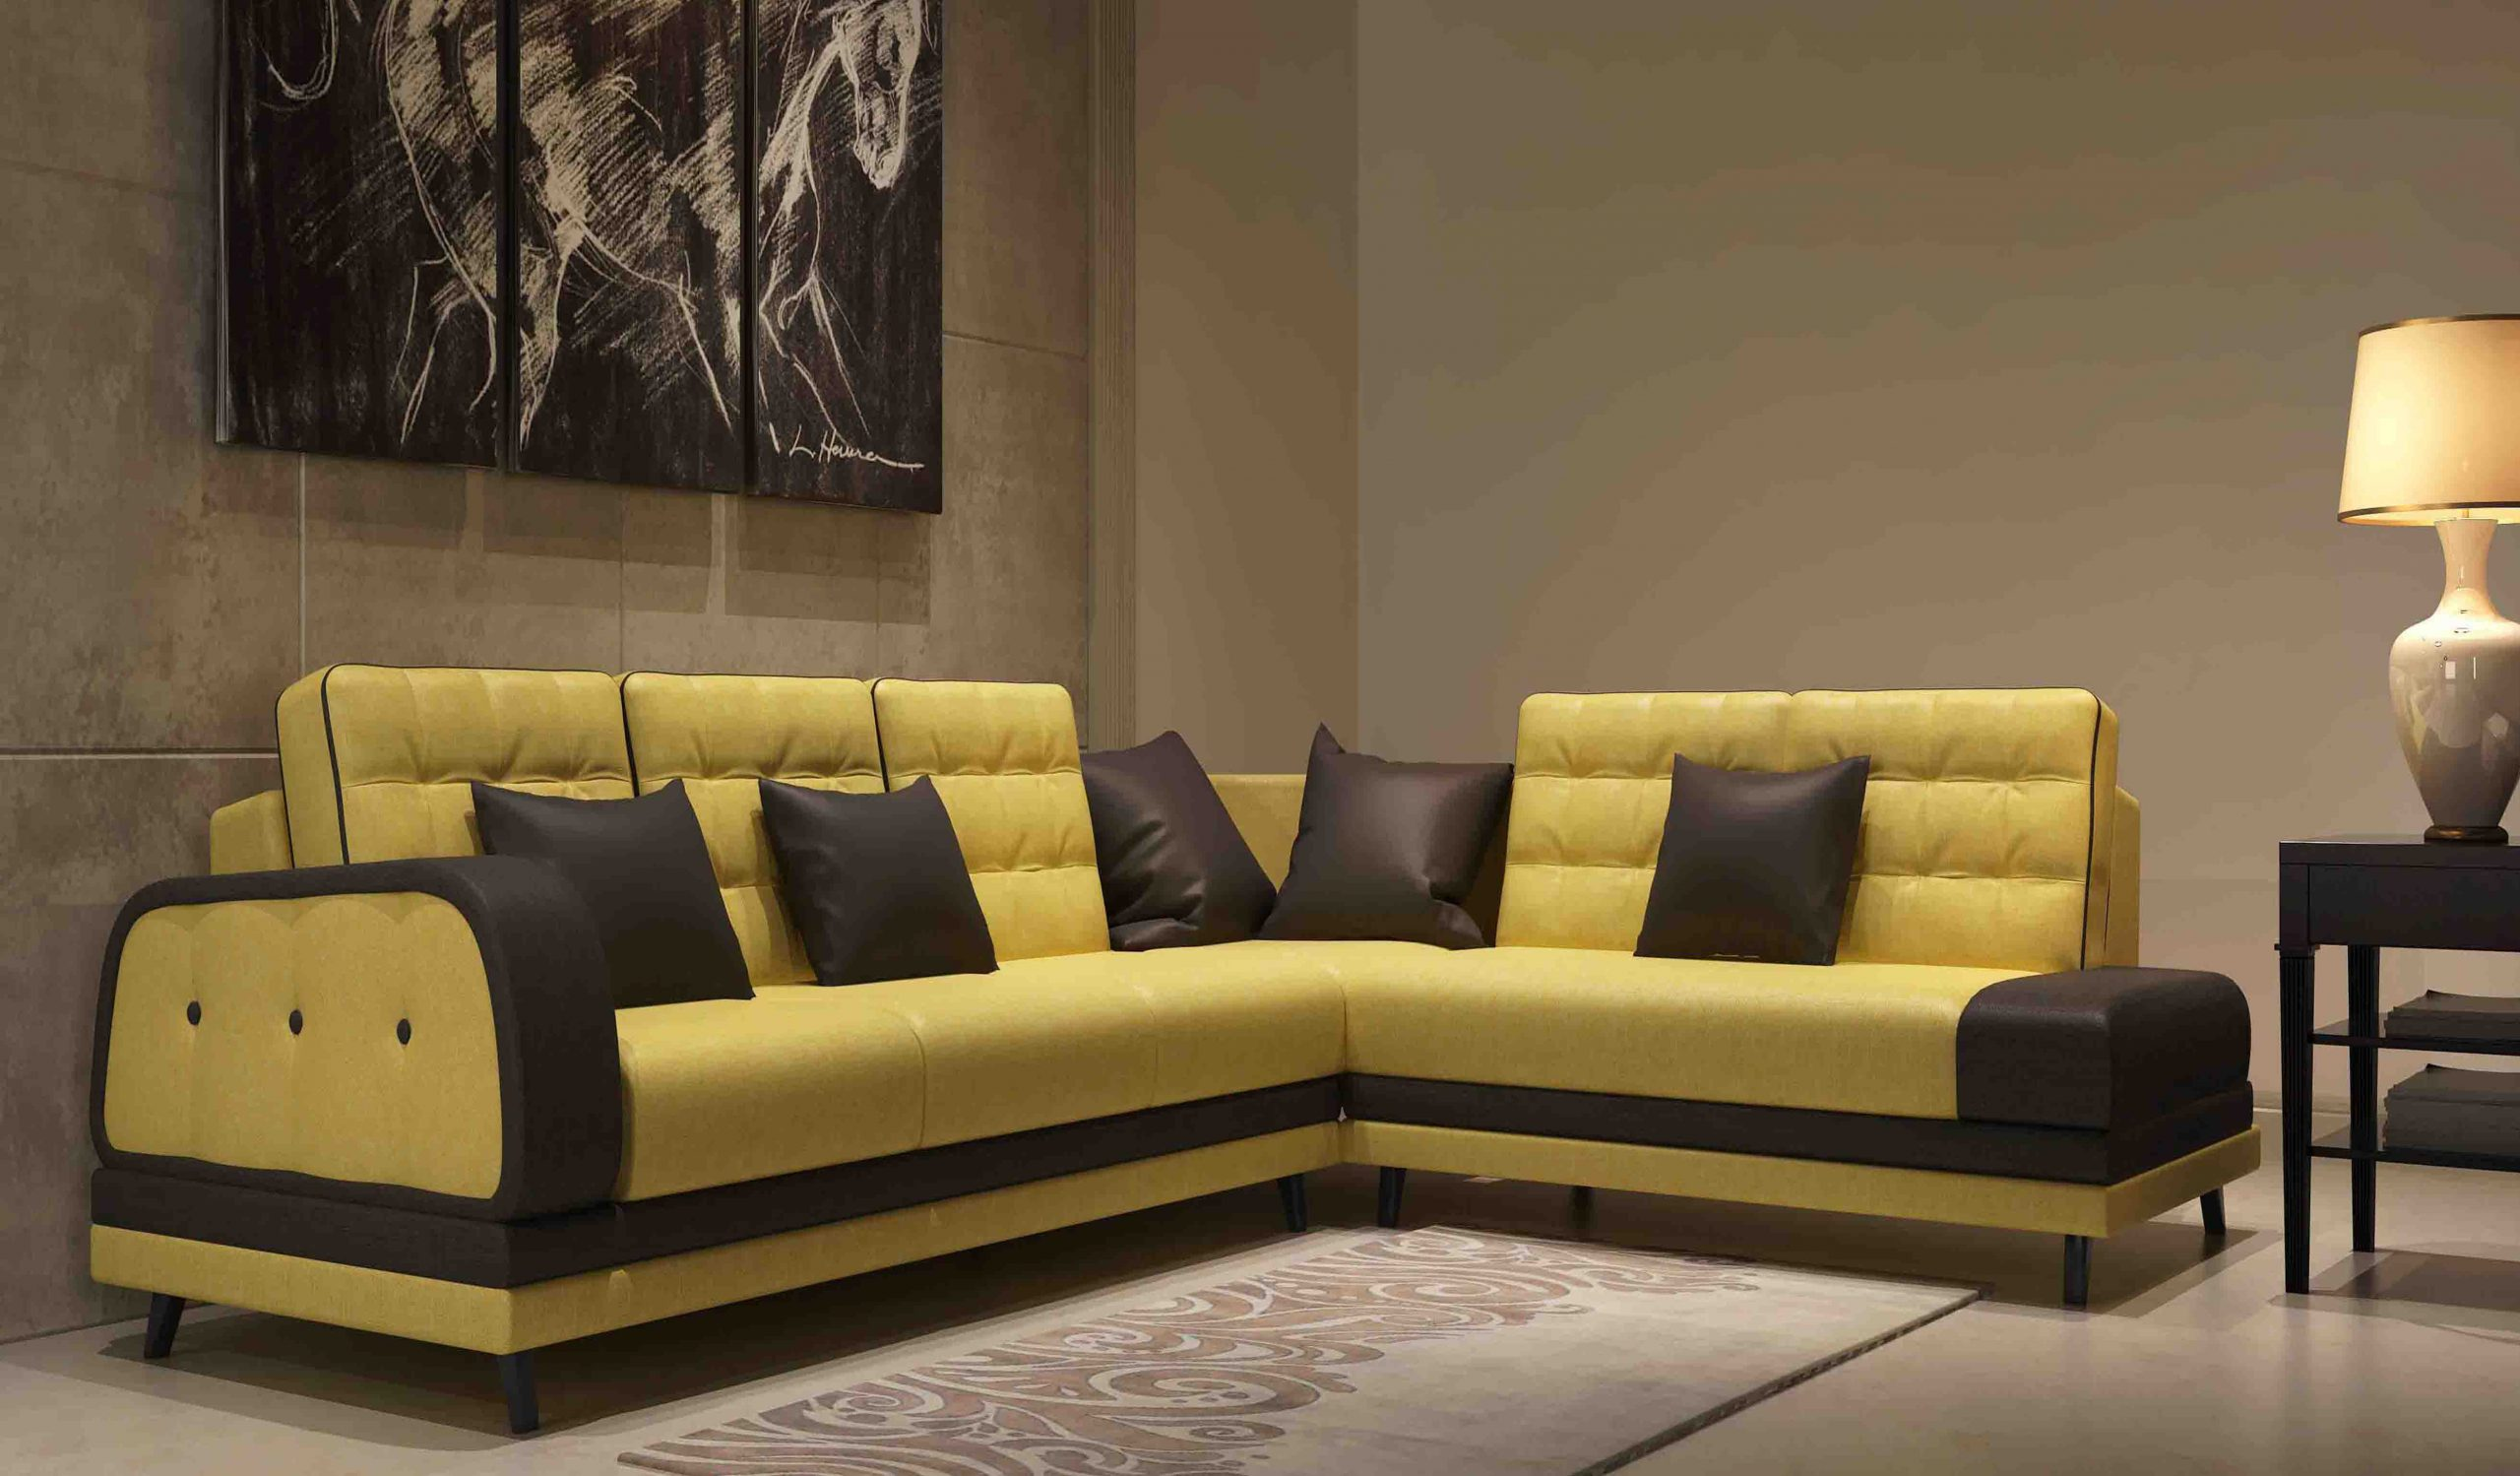 New arrivals of furniture products in kerala-min-min